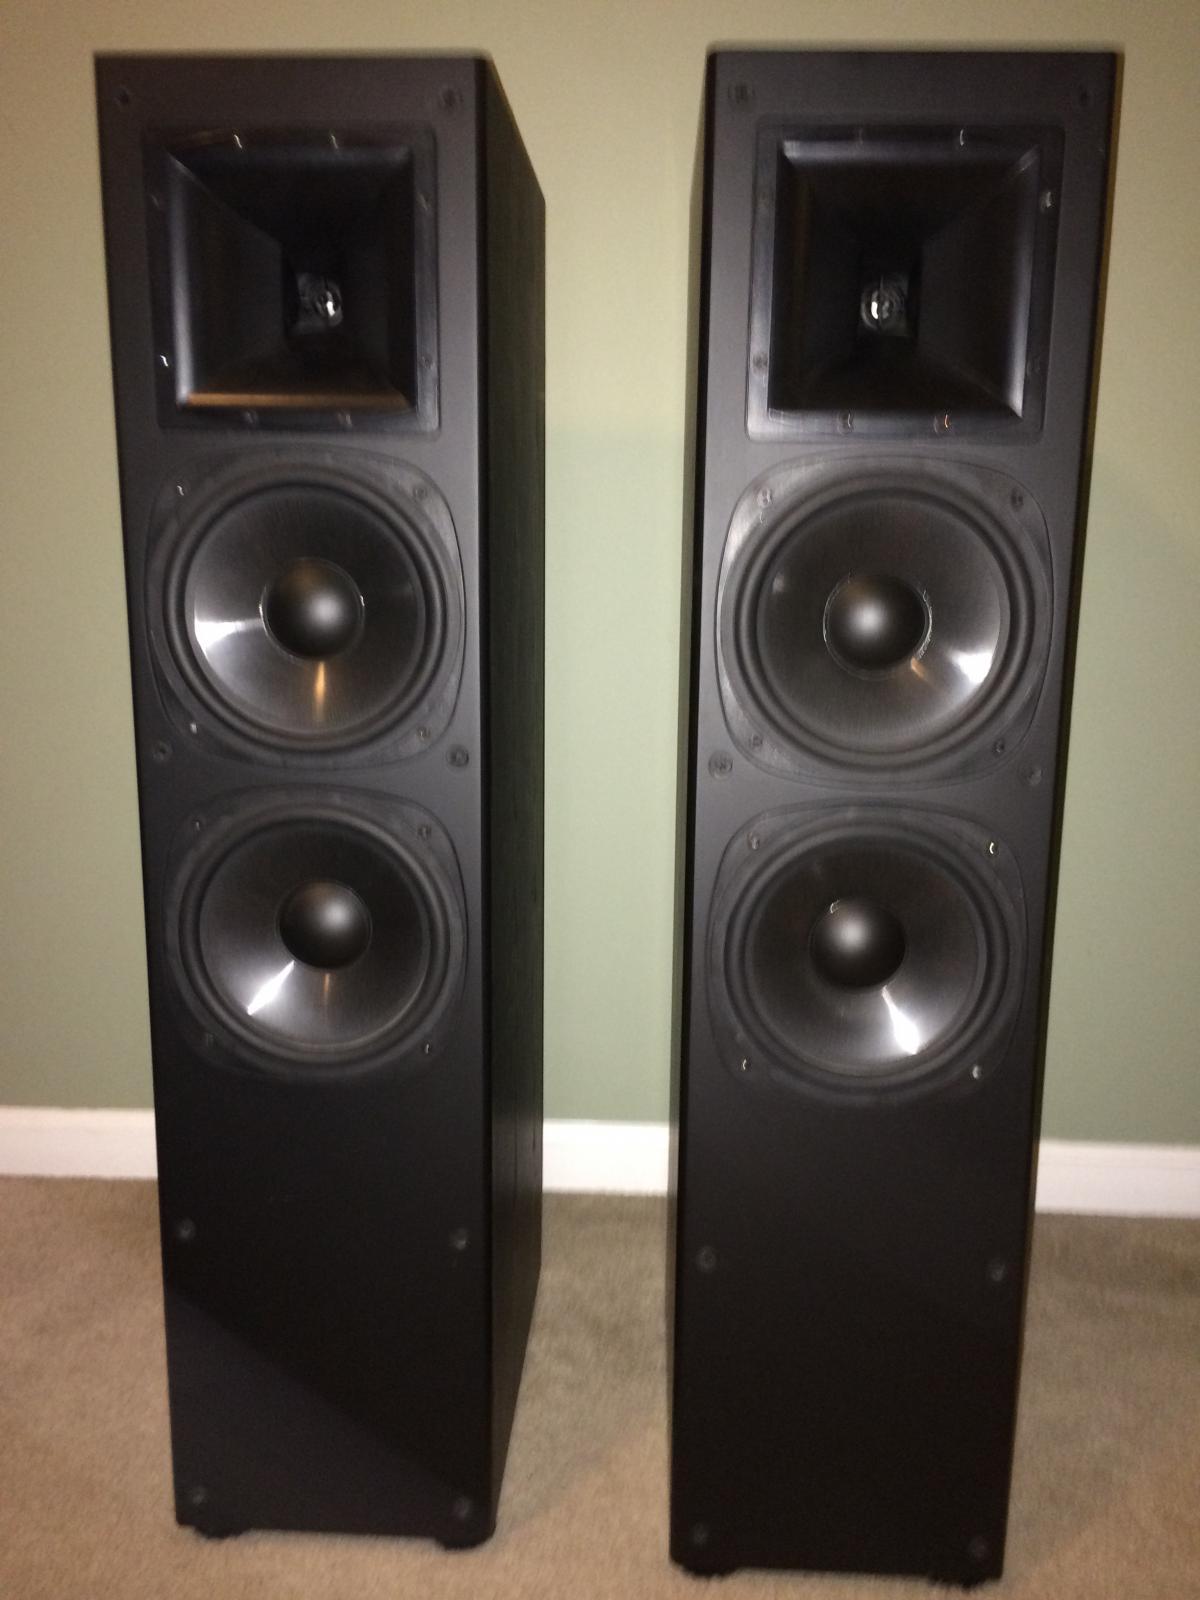 Sf 3 floorstanding speakers ksw 12 subwoofer for sale for 12 floor speakers